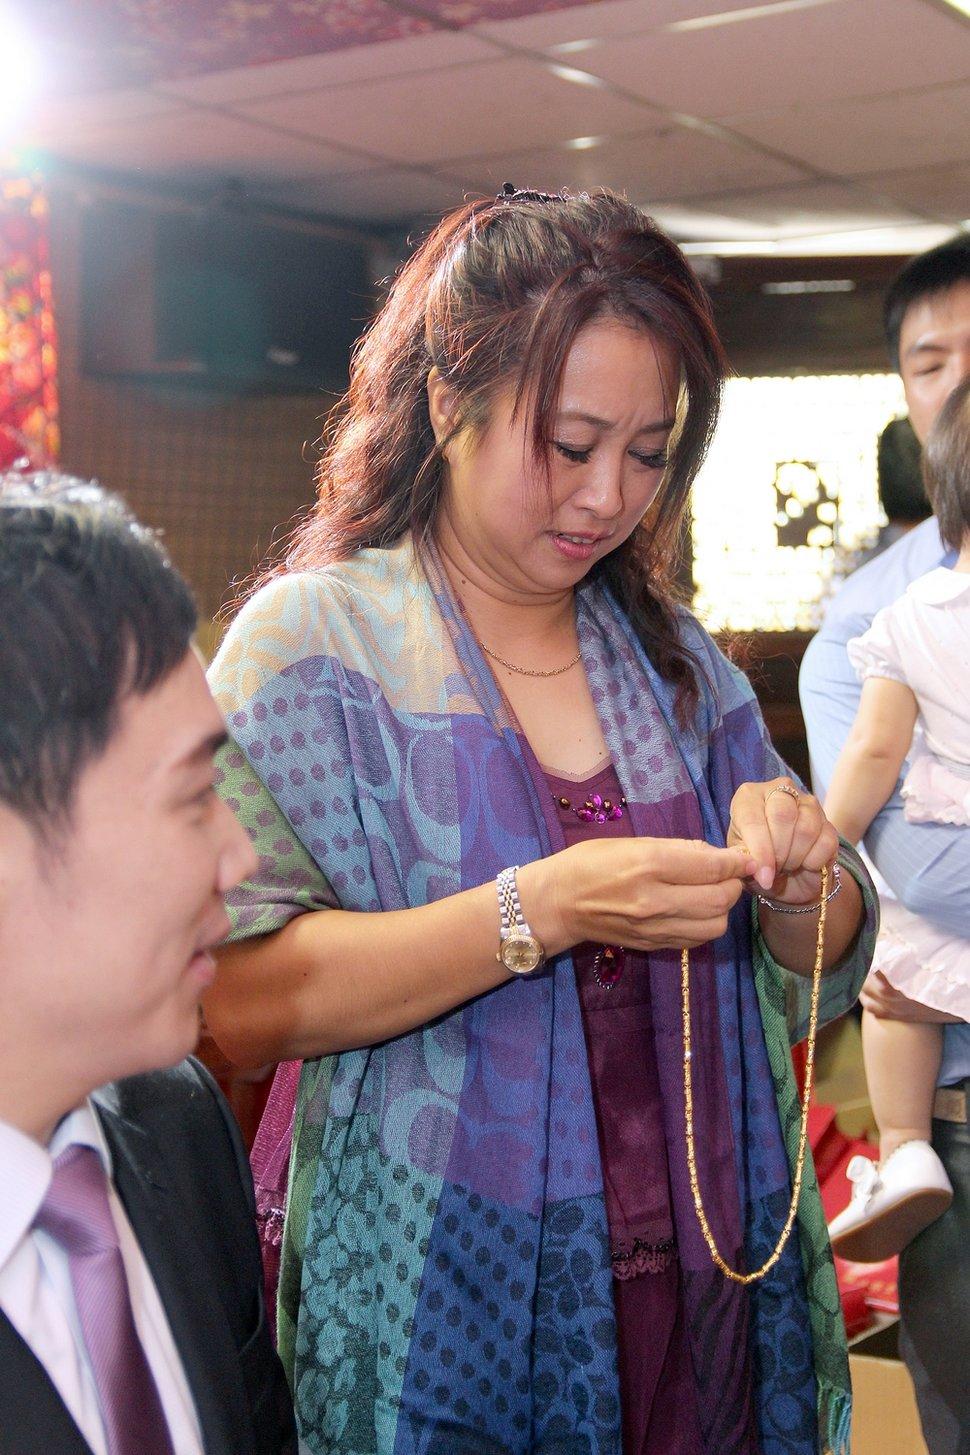 IMG_0127 - 瑞比特婚禮紀錄攝影 - 結婚吧